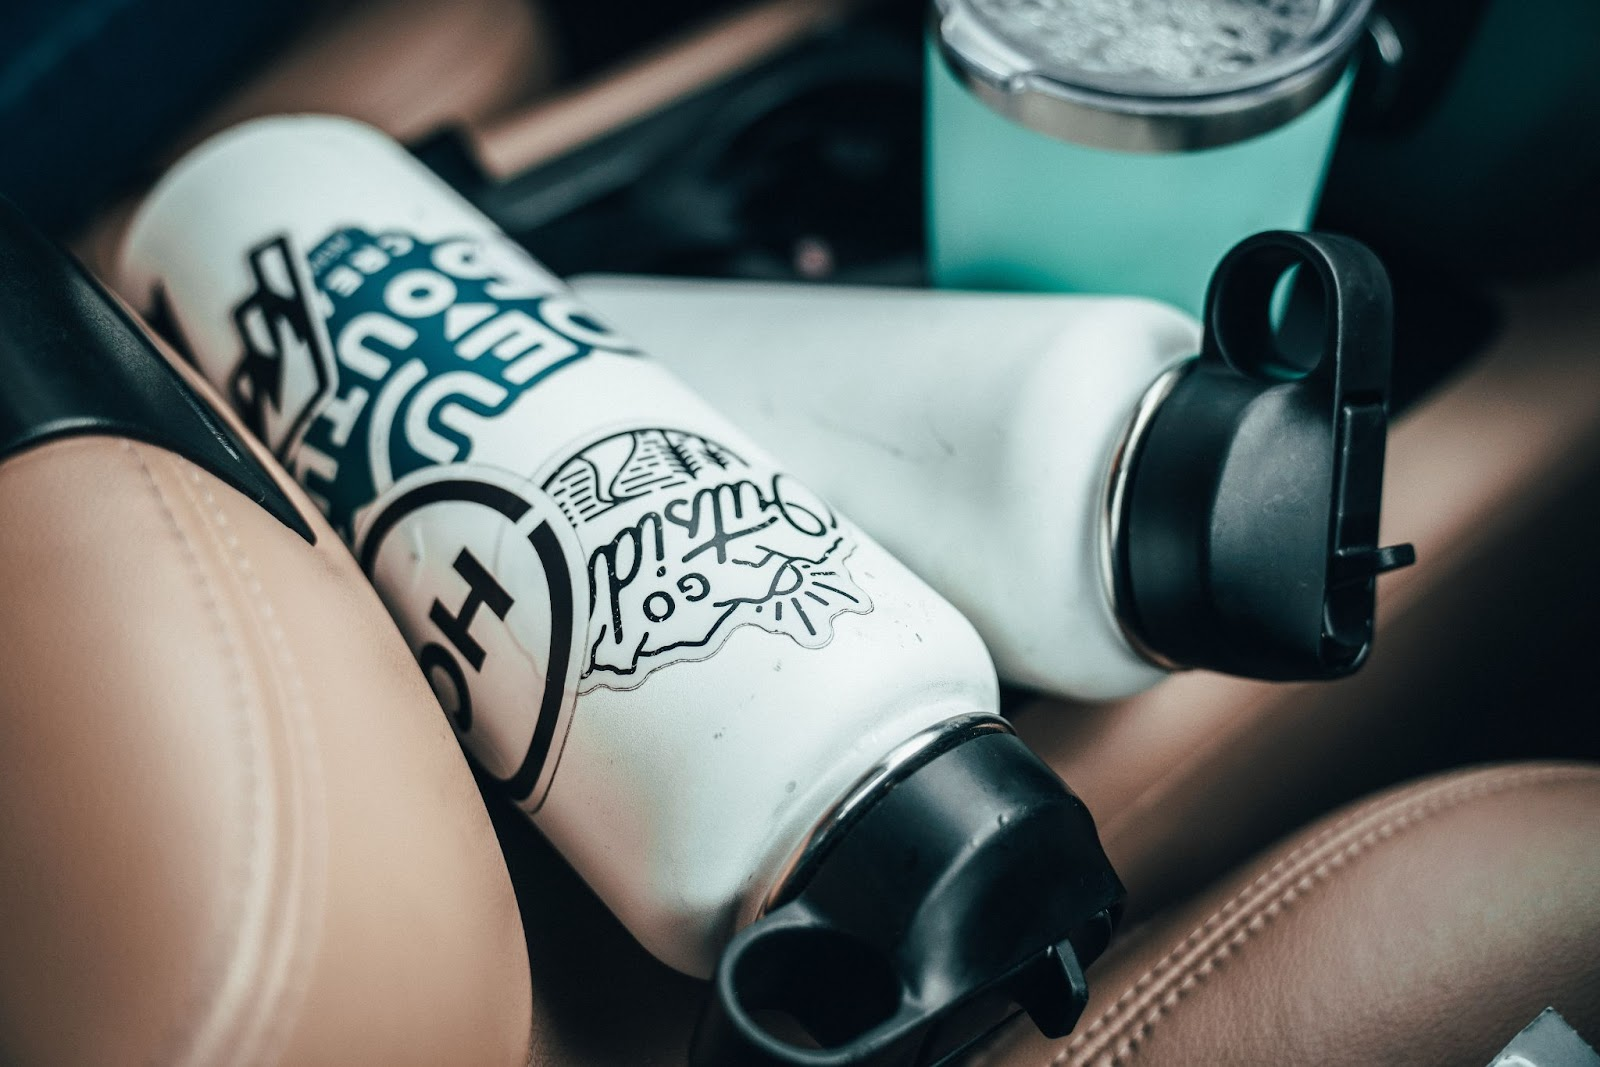 Custom stickers on a hydroflask in a car